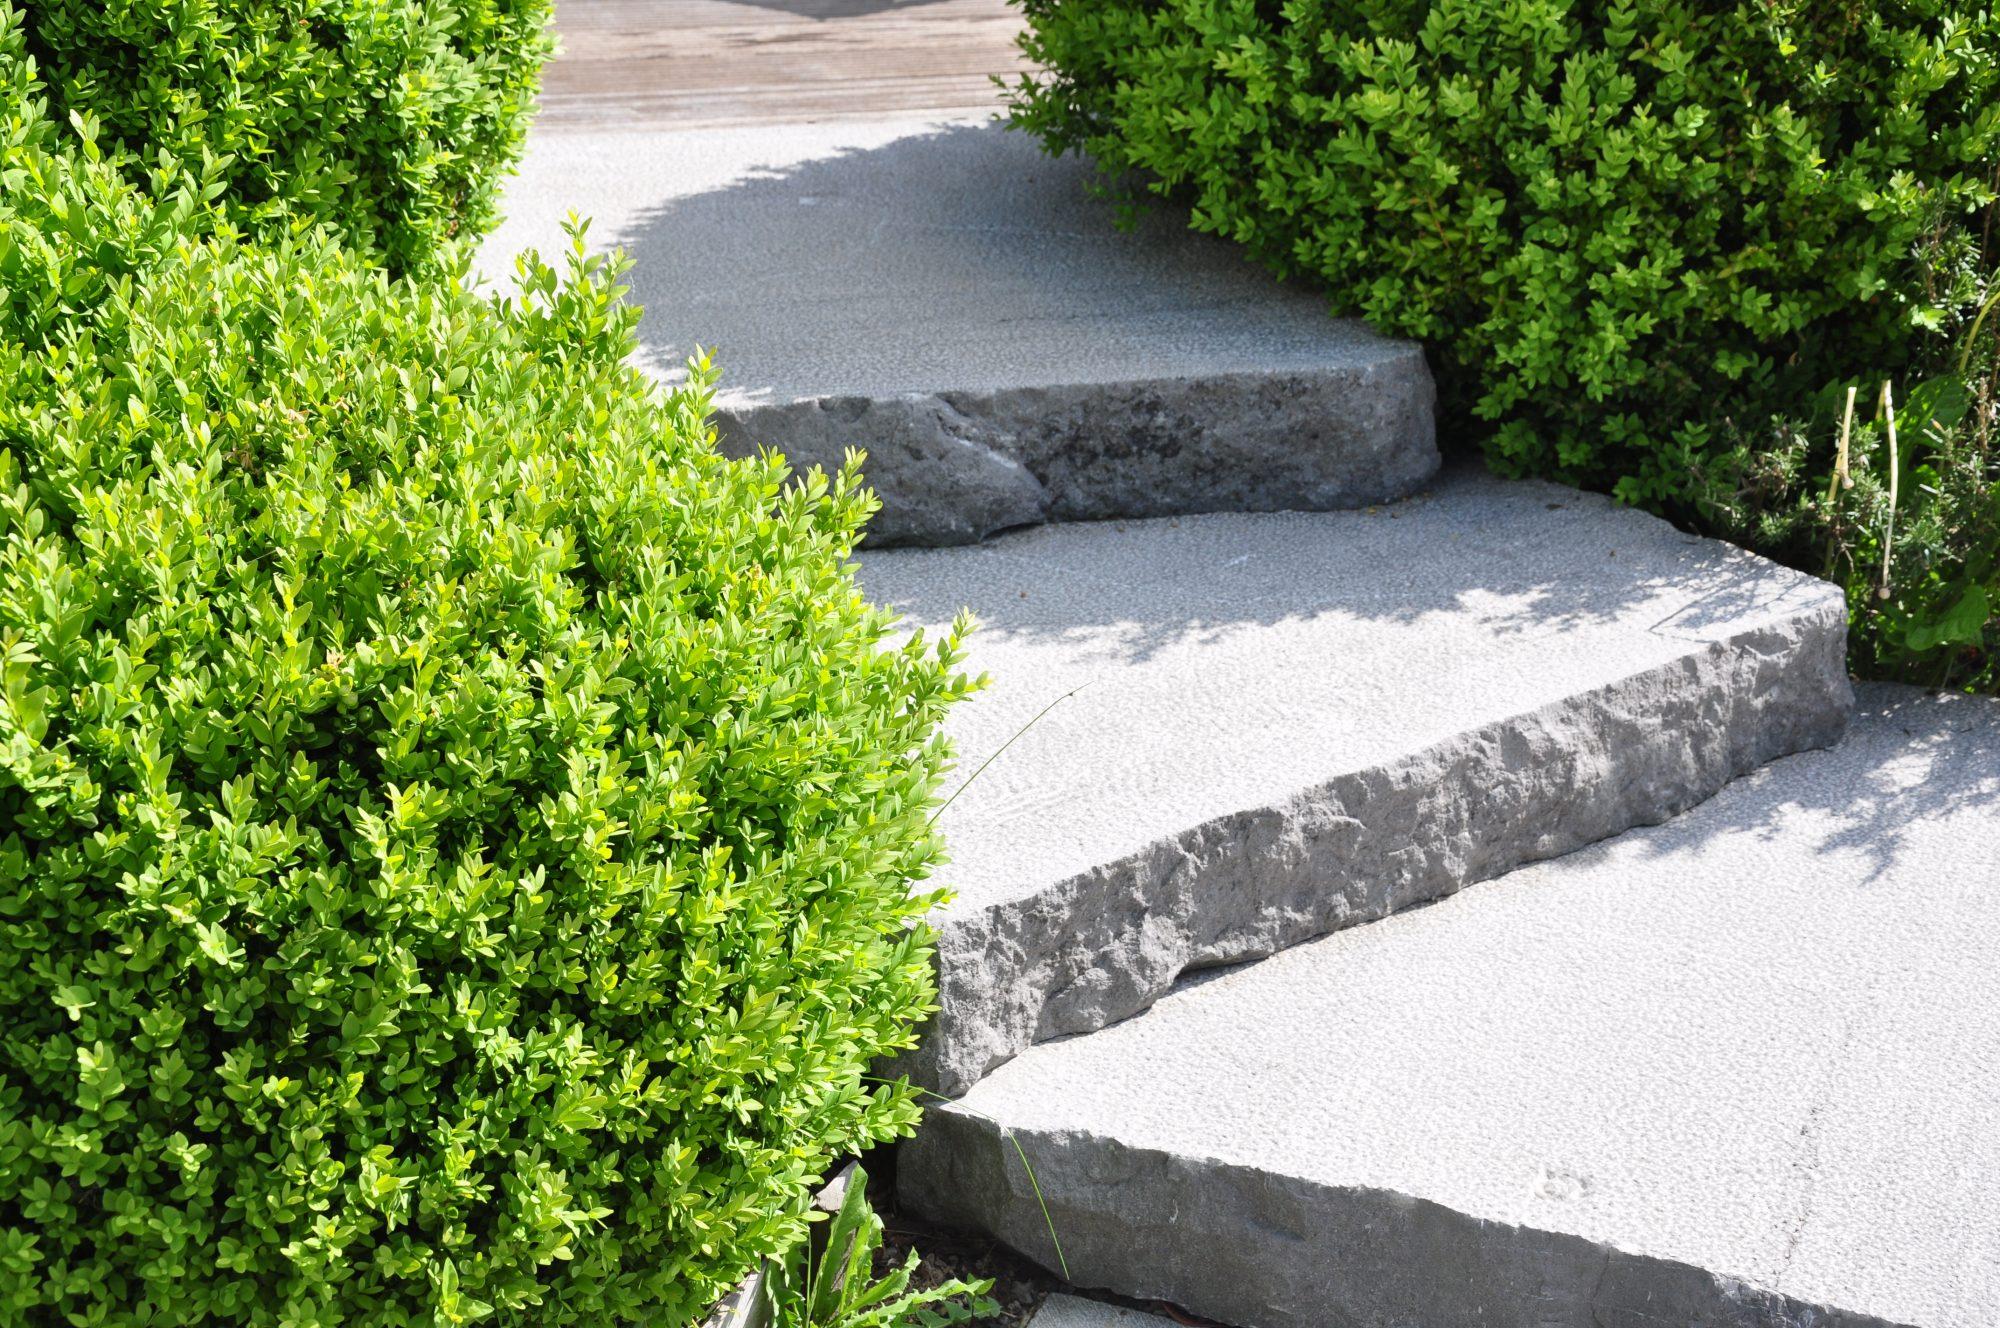 07 - Pierre Bleue Belge - escalier